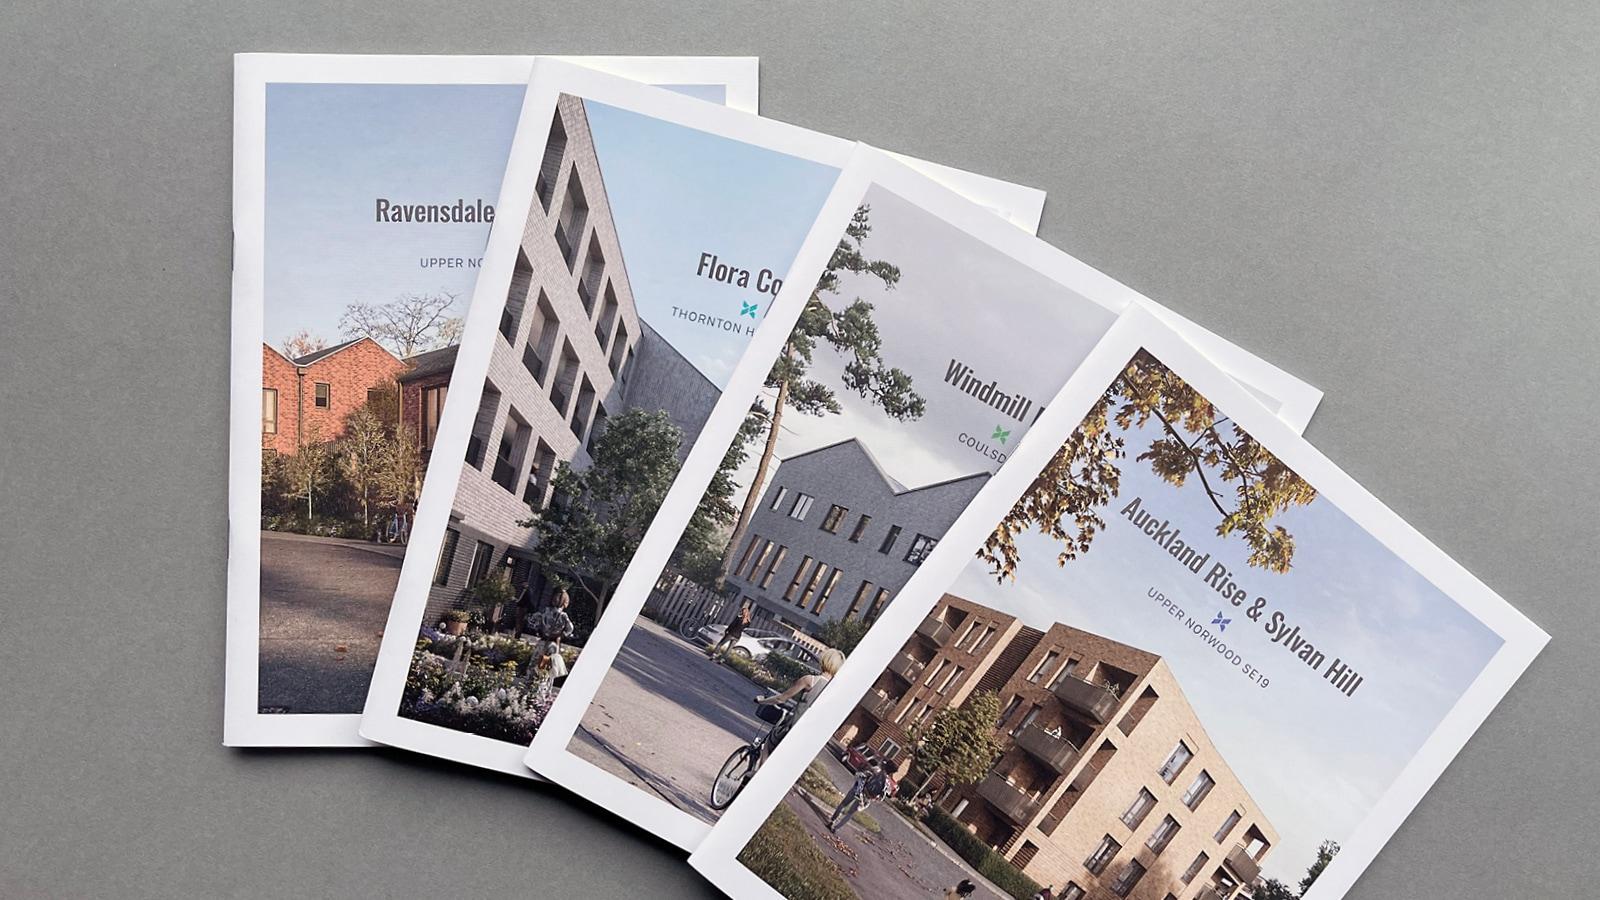 property-architecture-branding-communication-sales-brochure-design-milton-keynes-london2